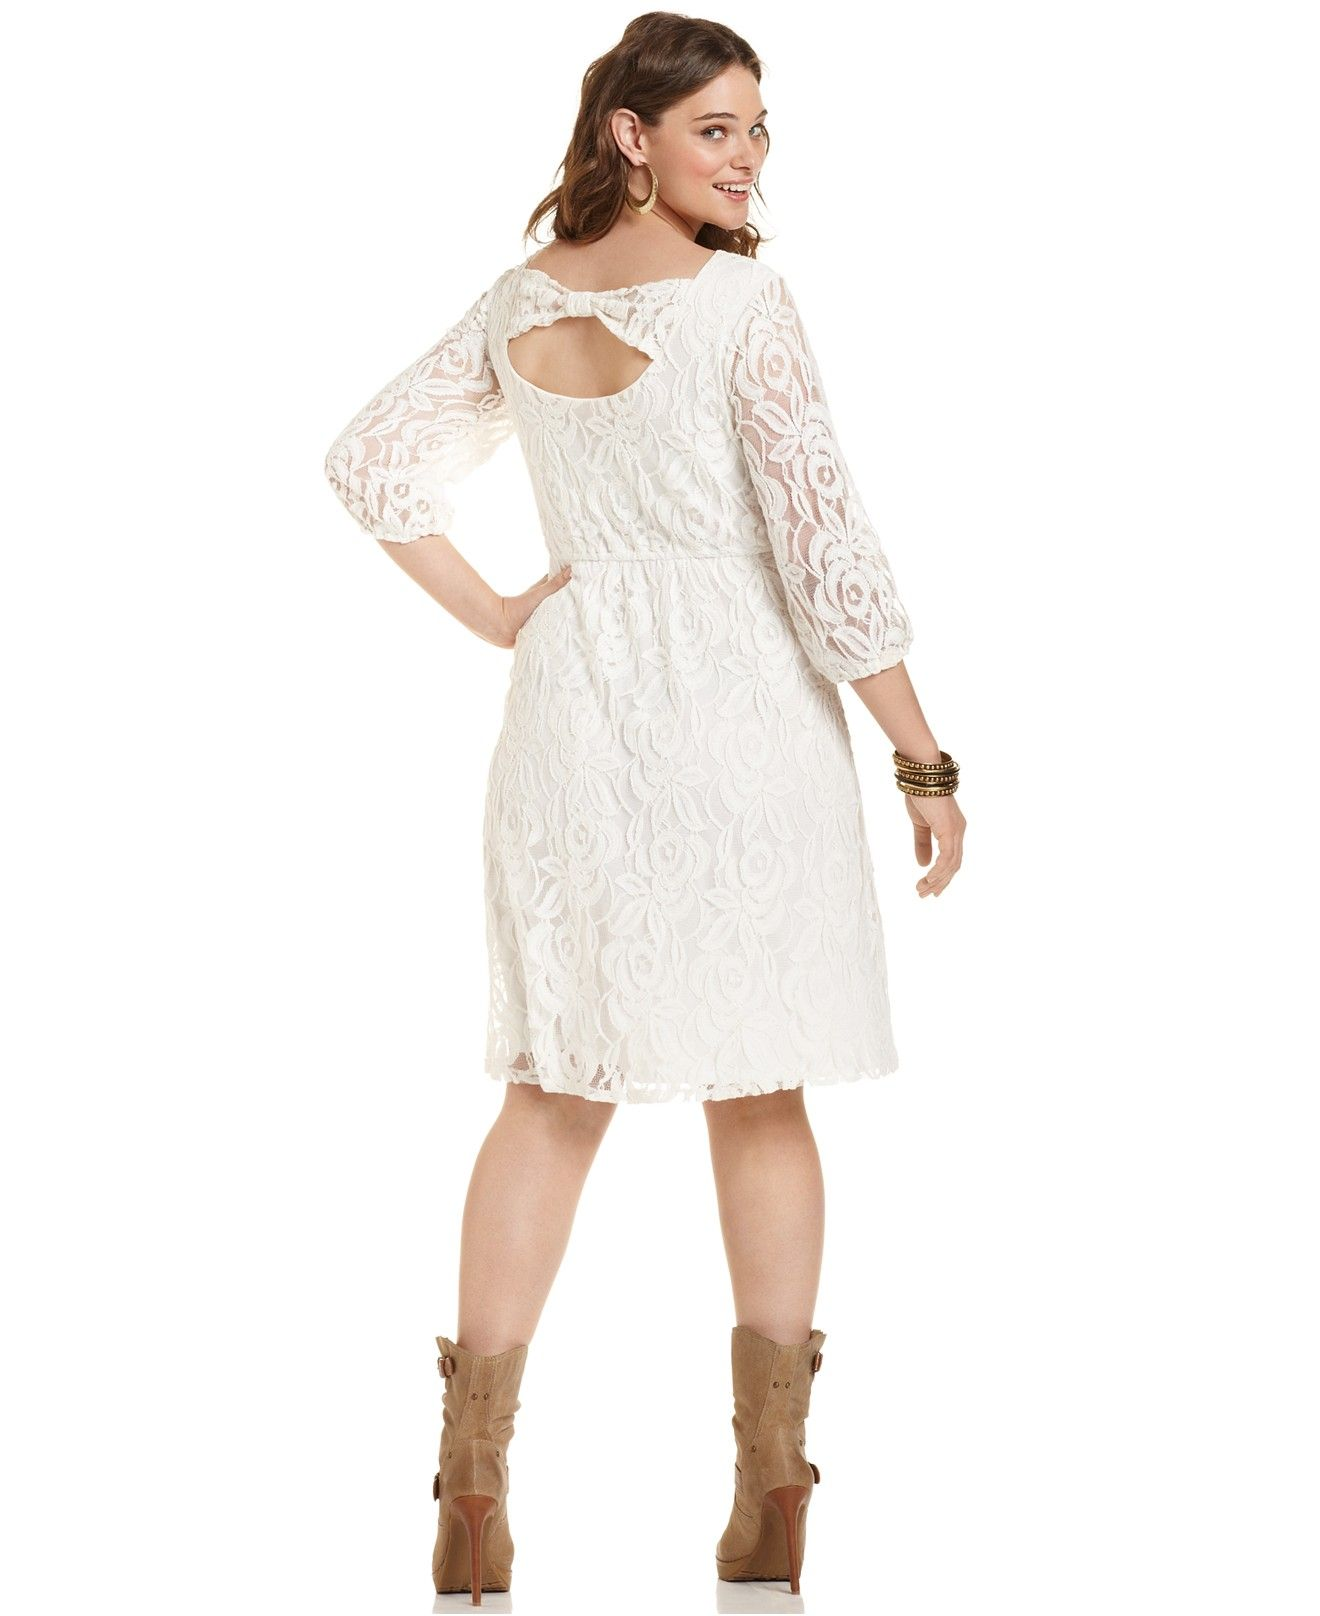 6c385208217 ING Plus Size Three-Quarter-Sleeve Lace Dress - Dresses - Plus Sizes -  Macy s